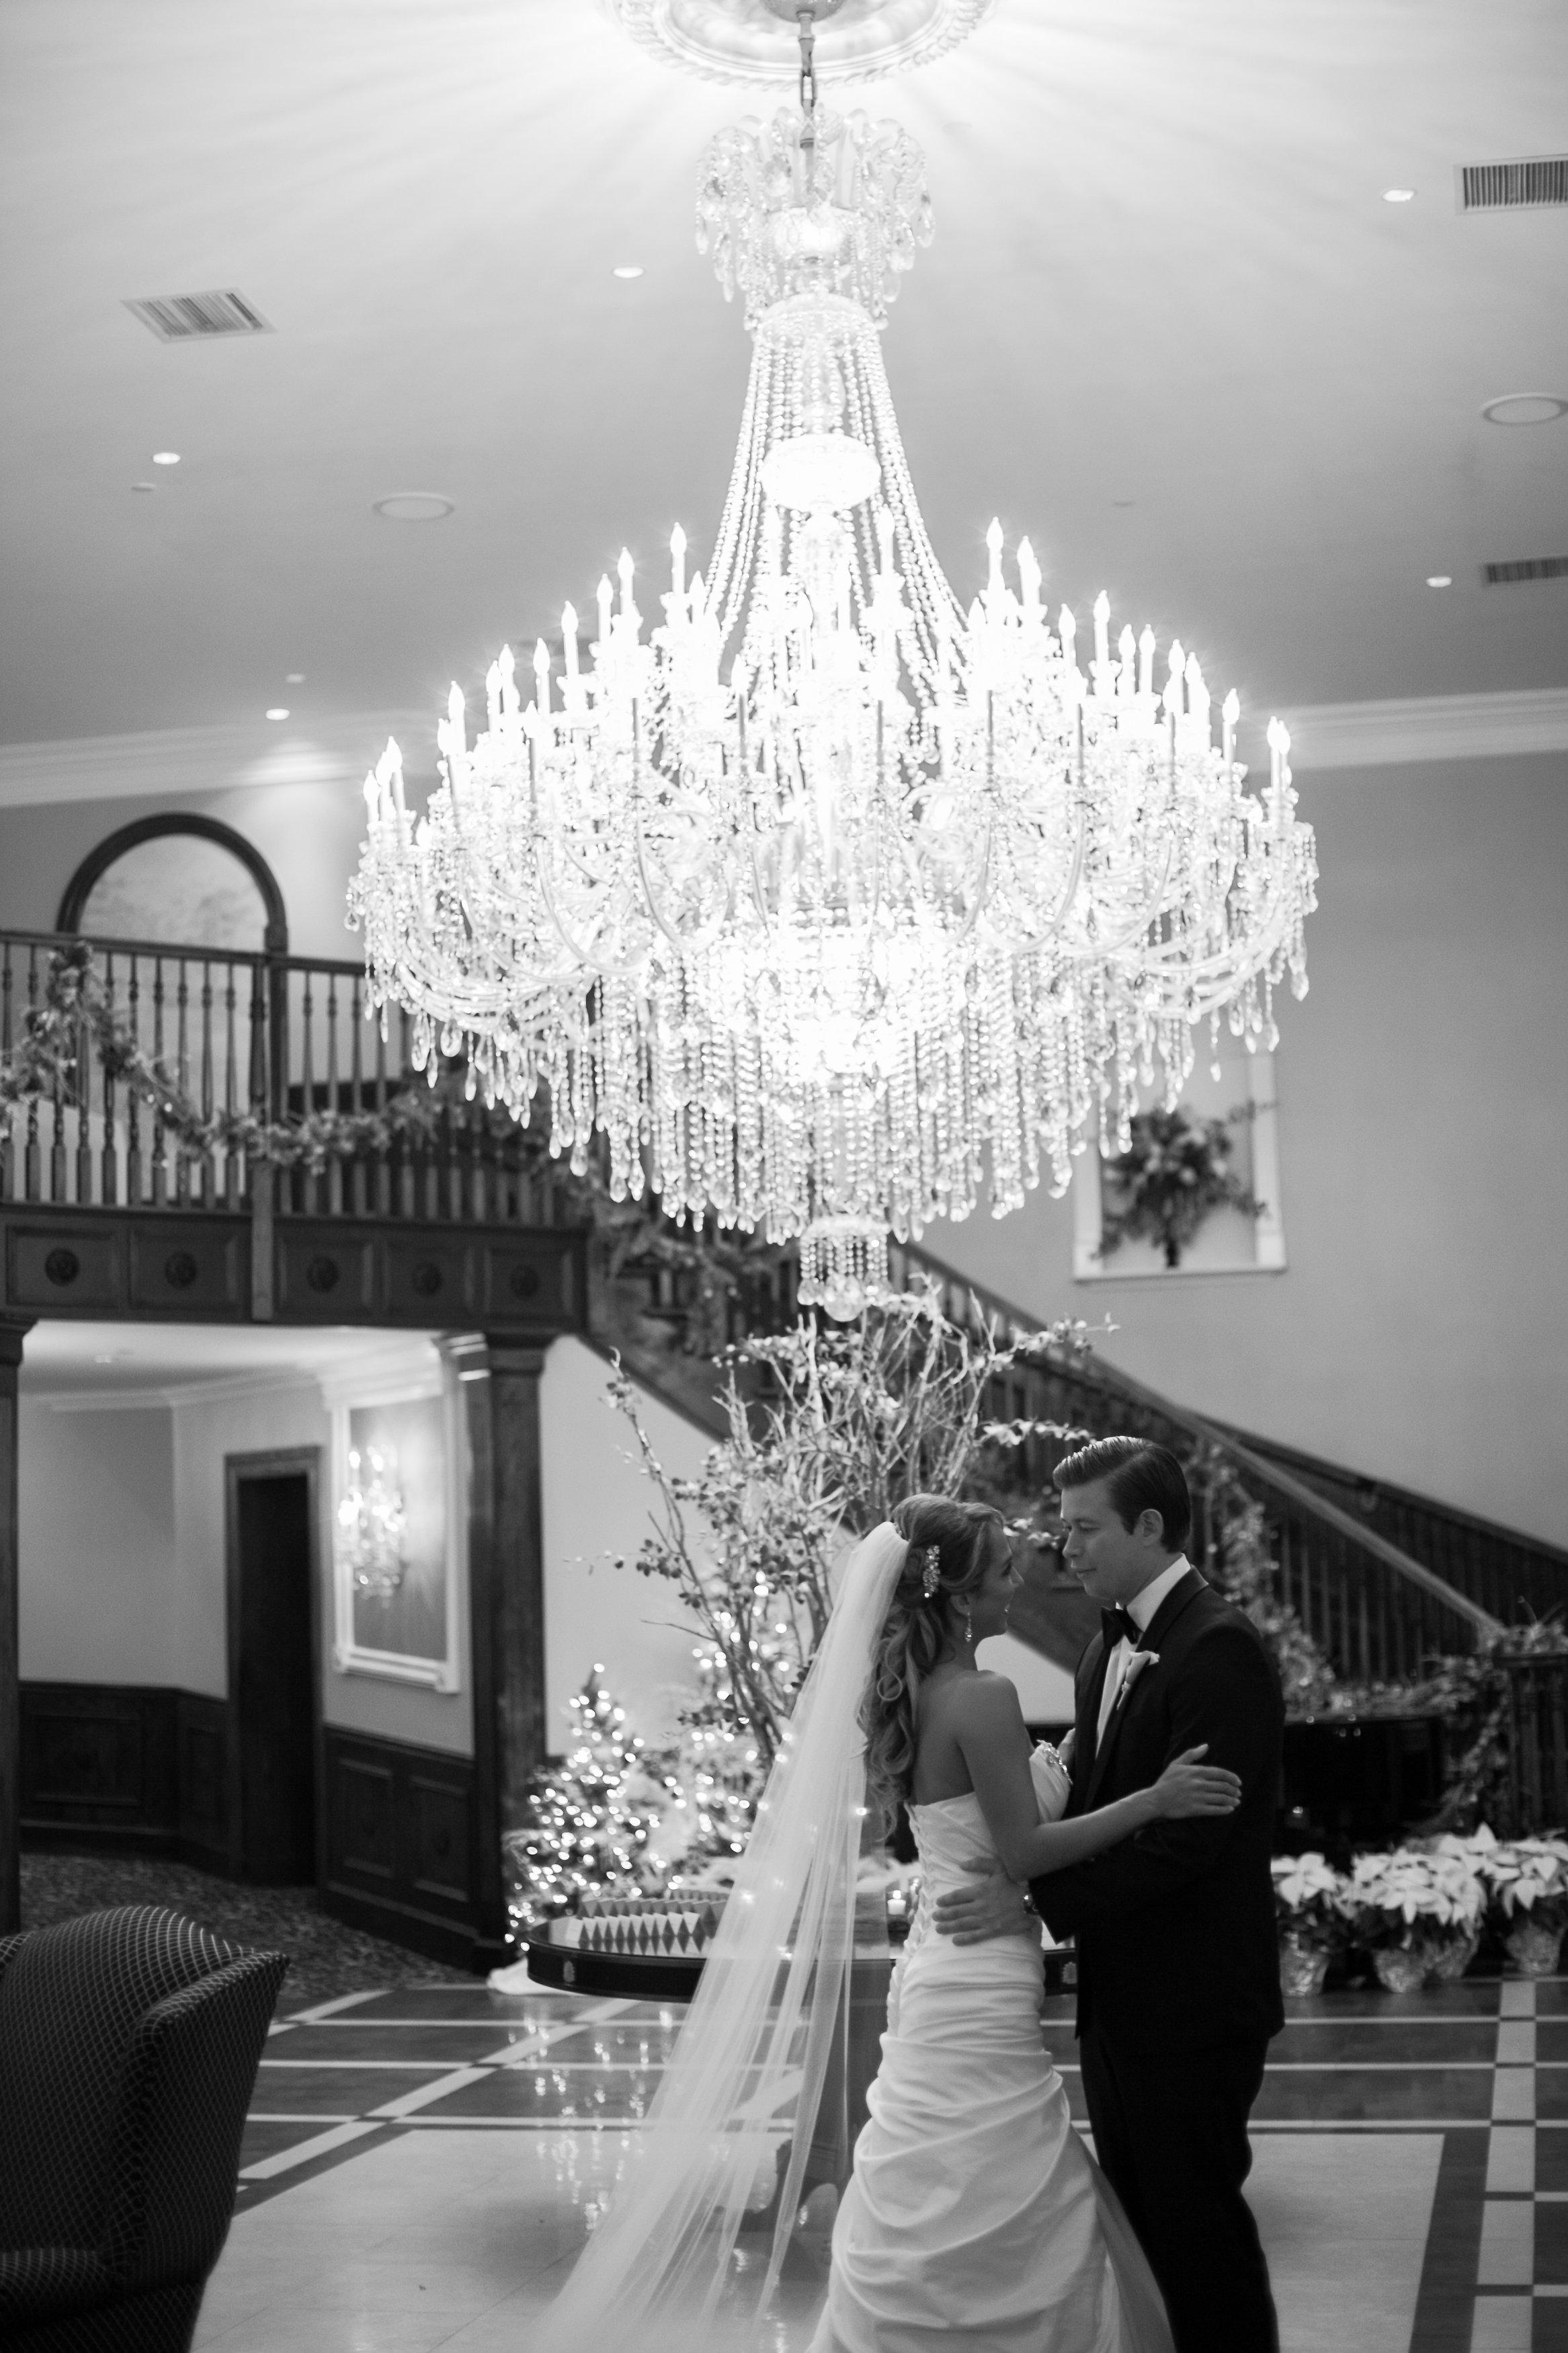 Ceci_New_York_Custom_Invitation_ New_Jersey_Wedding_Luxury_Personalized_Ceci_Style_Bride_Foil_Stamping151.JPG